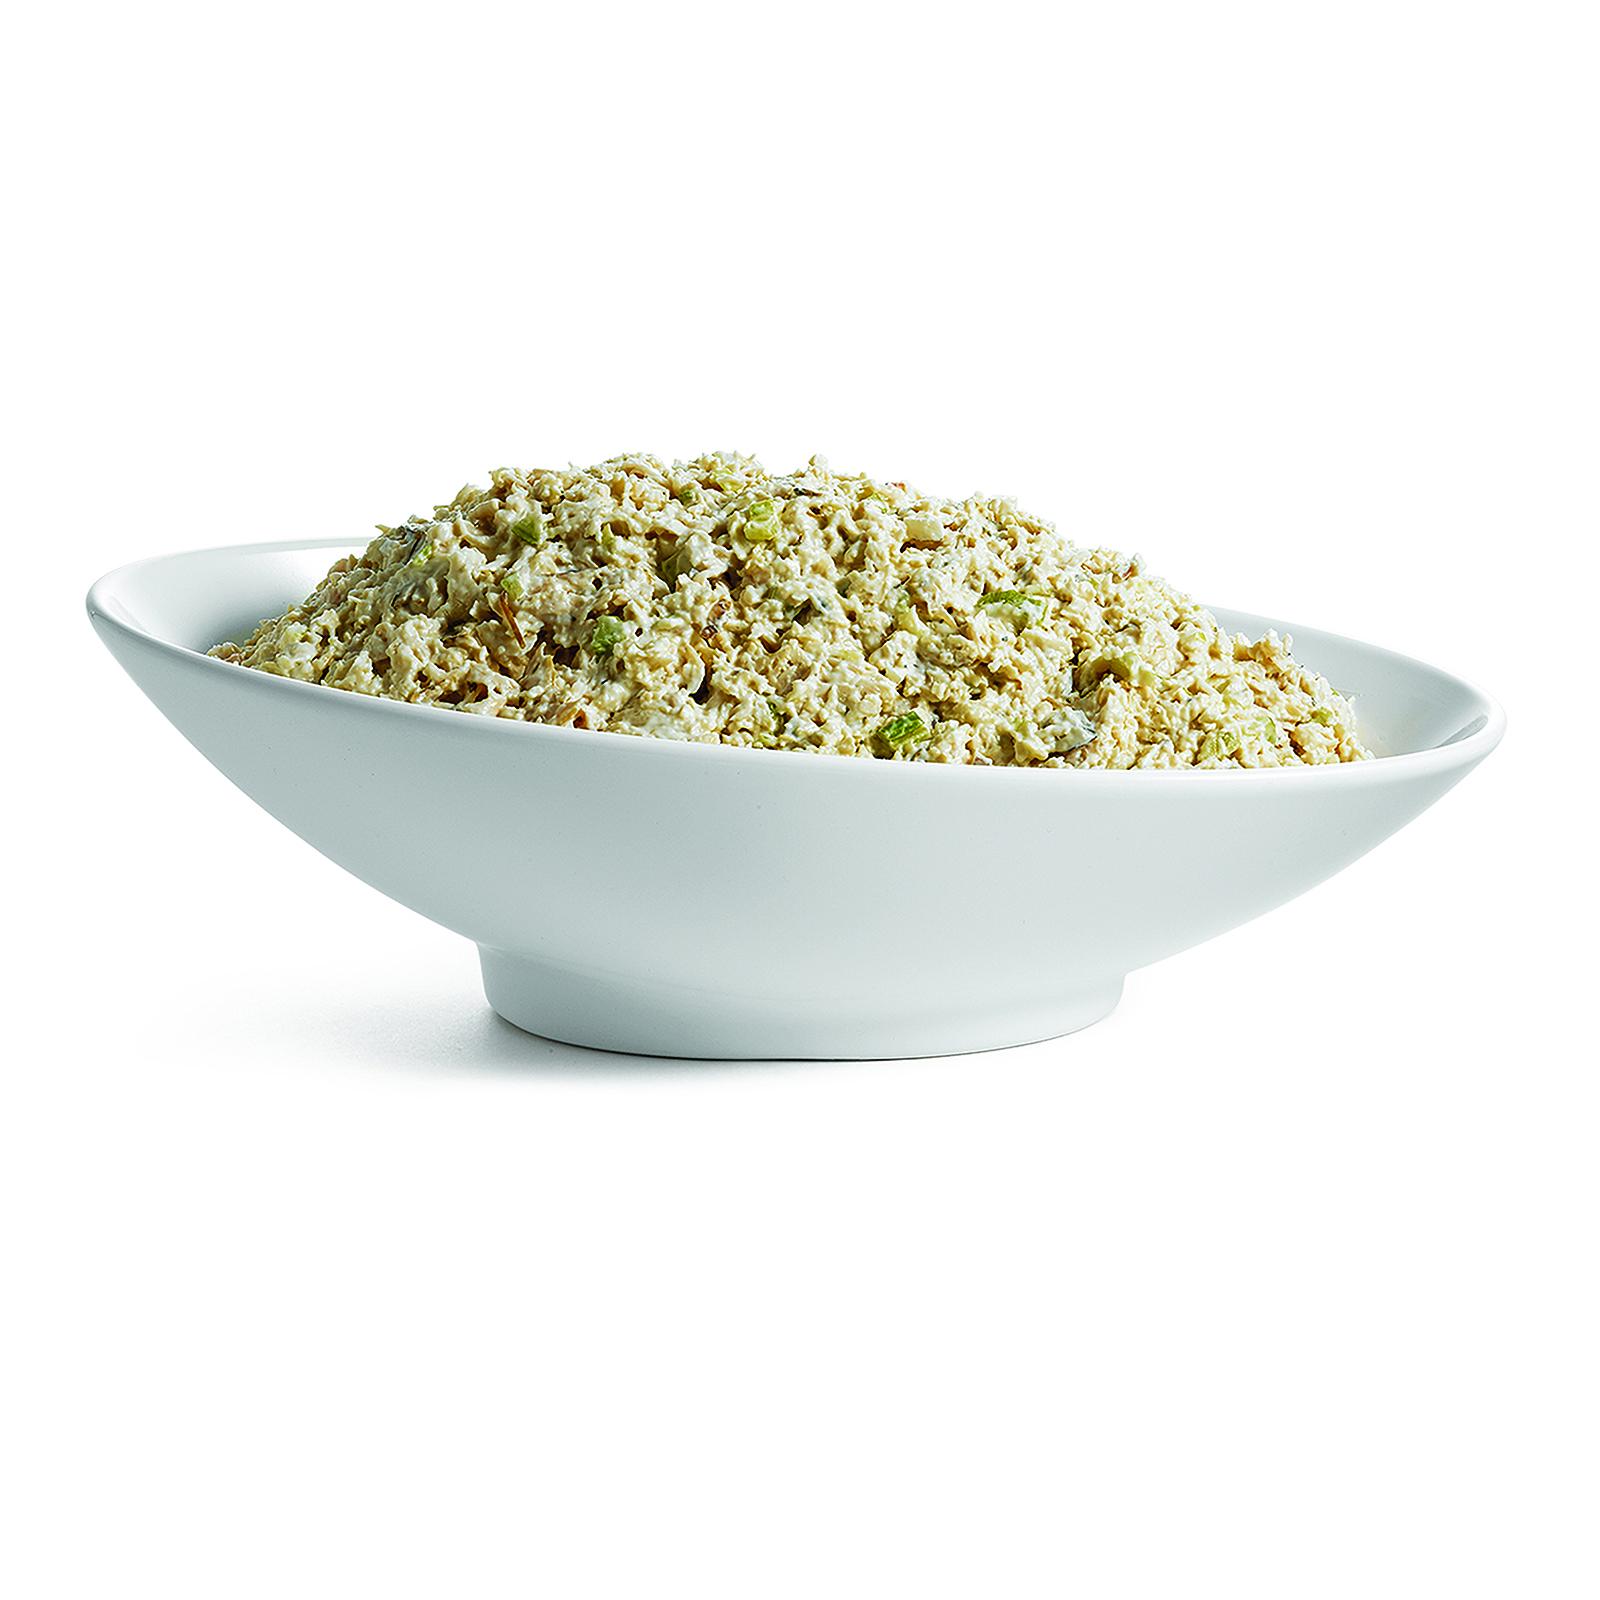 TableCraft Products M4084WH bowl, plastic,  1 - 2 qt (32 - 95 oz)